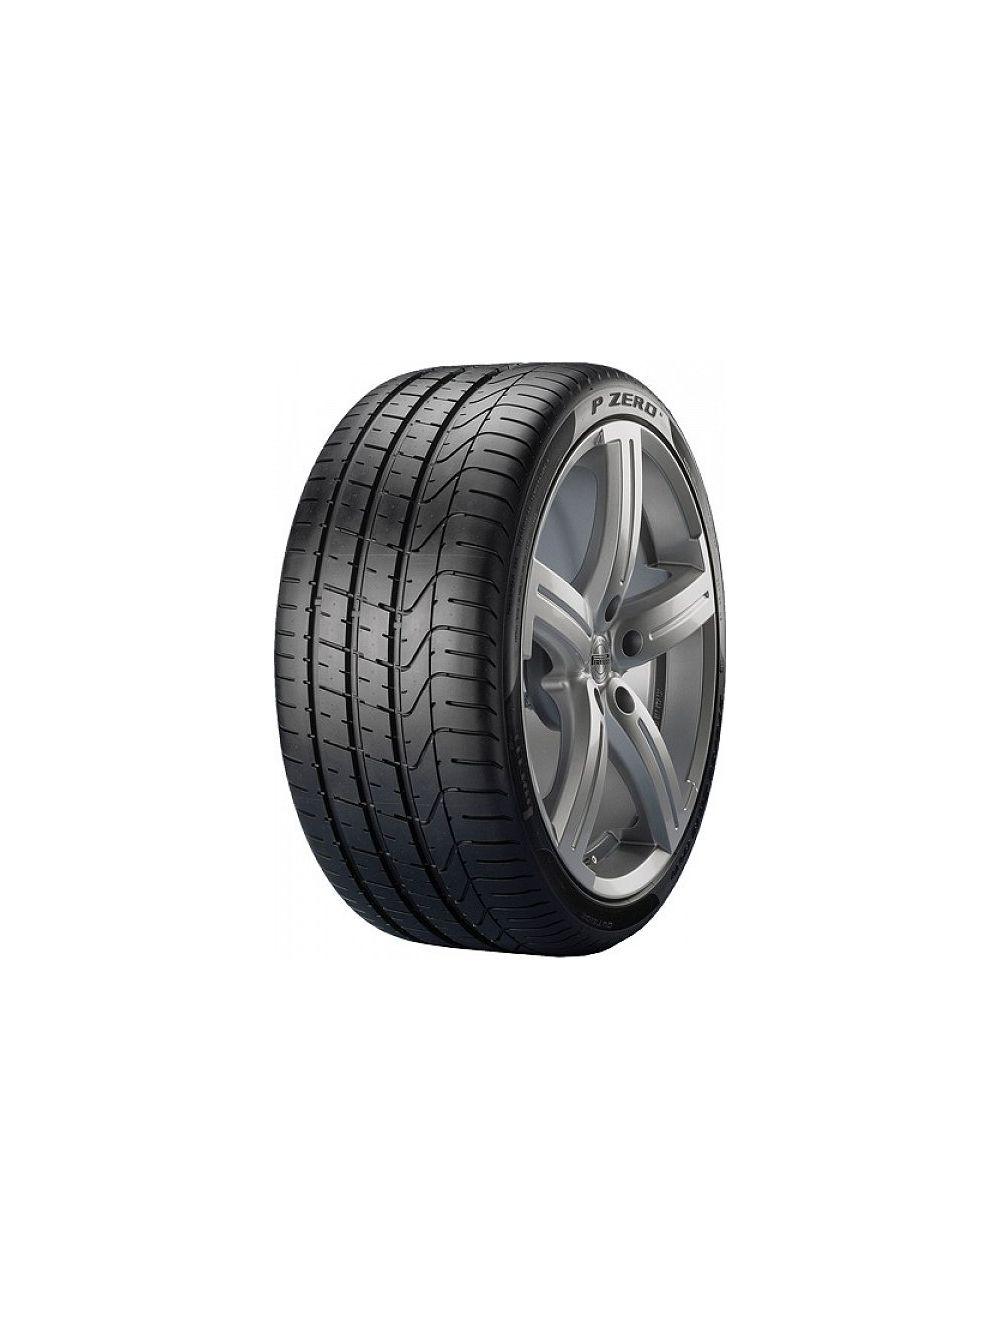 Pirelli 275/30R20 Y PZero RO1 XL Nyári gumi